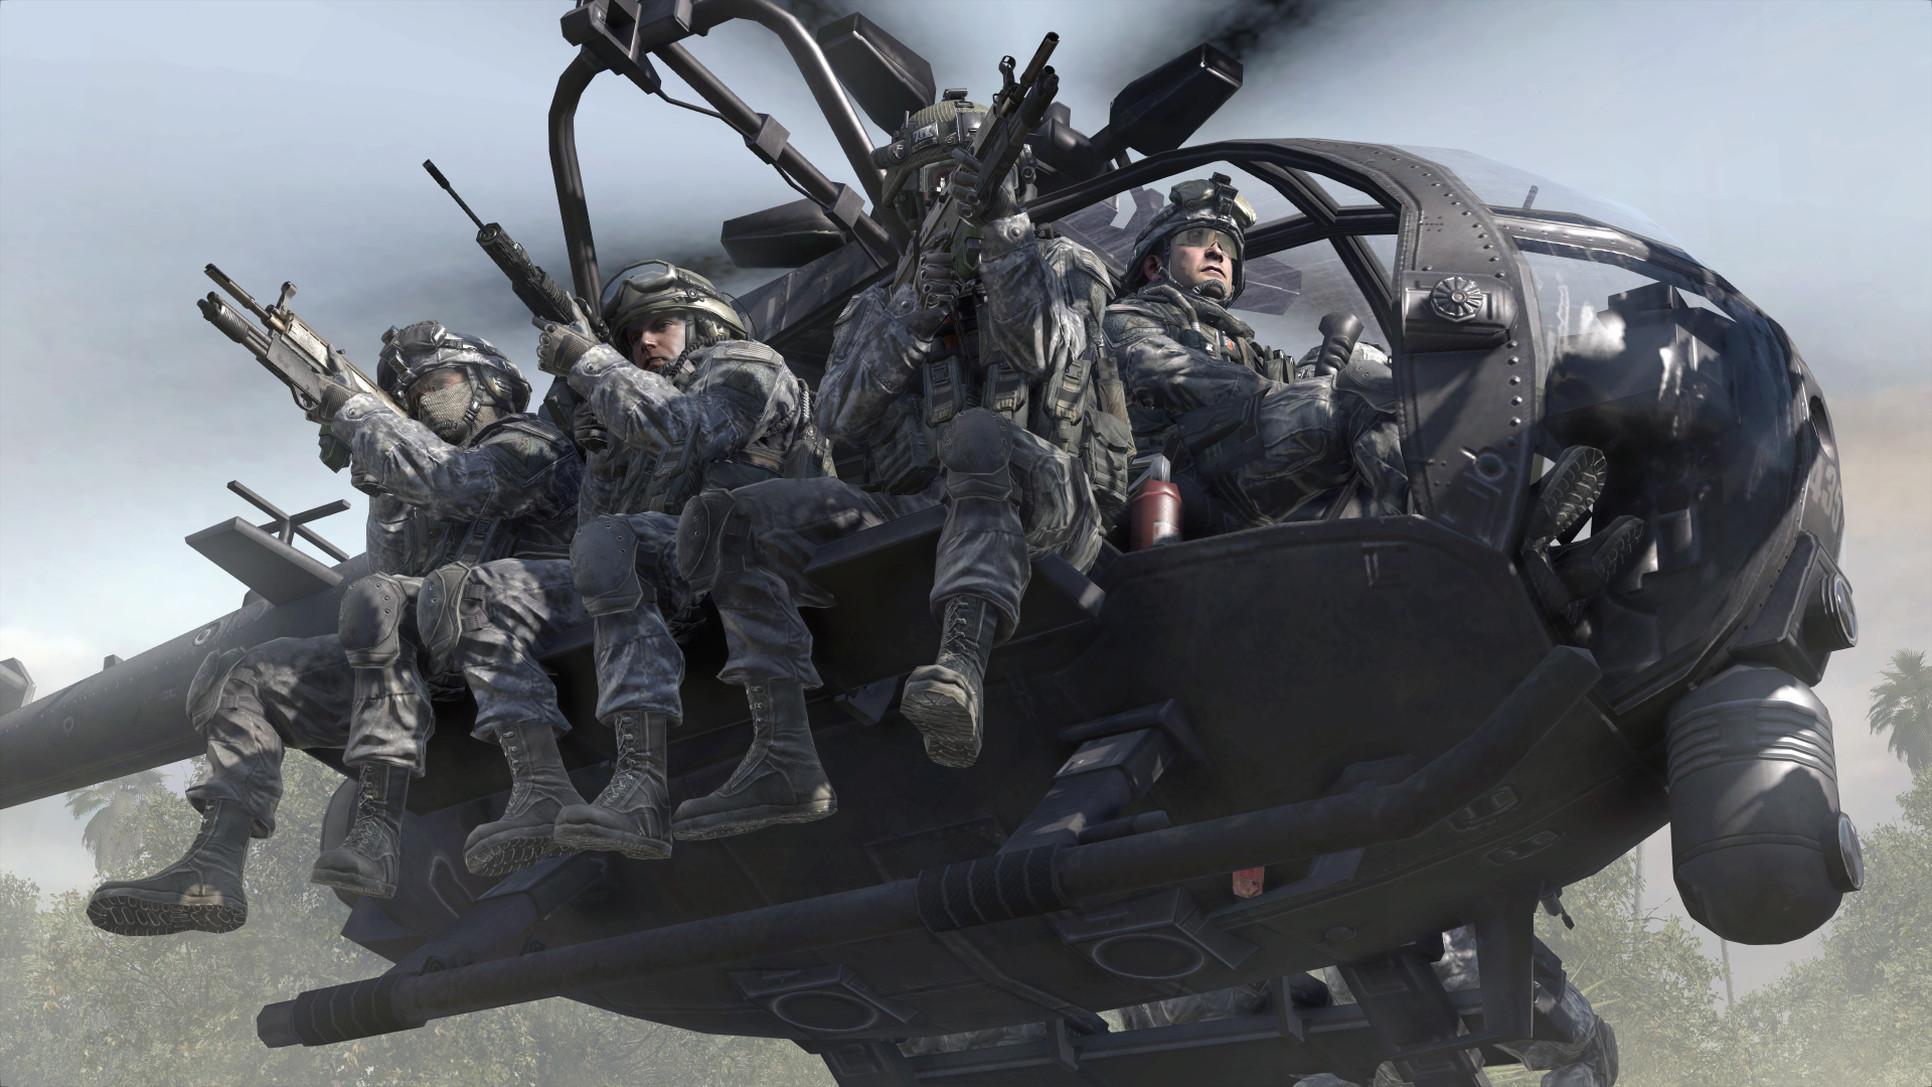 Call Of Duty Modern Warfare 2 Ghost Video Games Wallpaper 4588